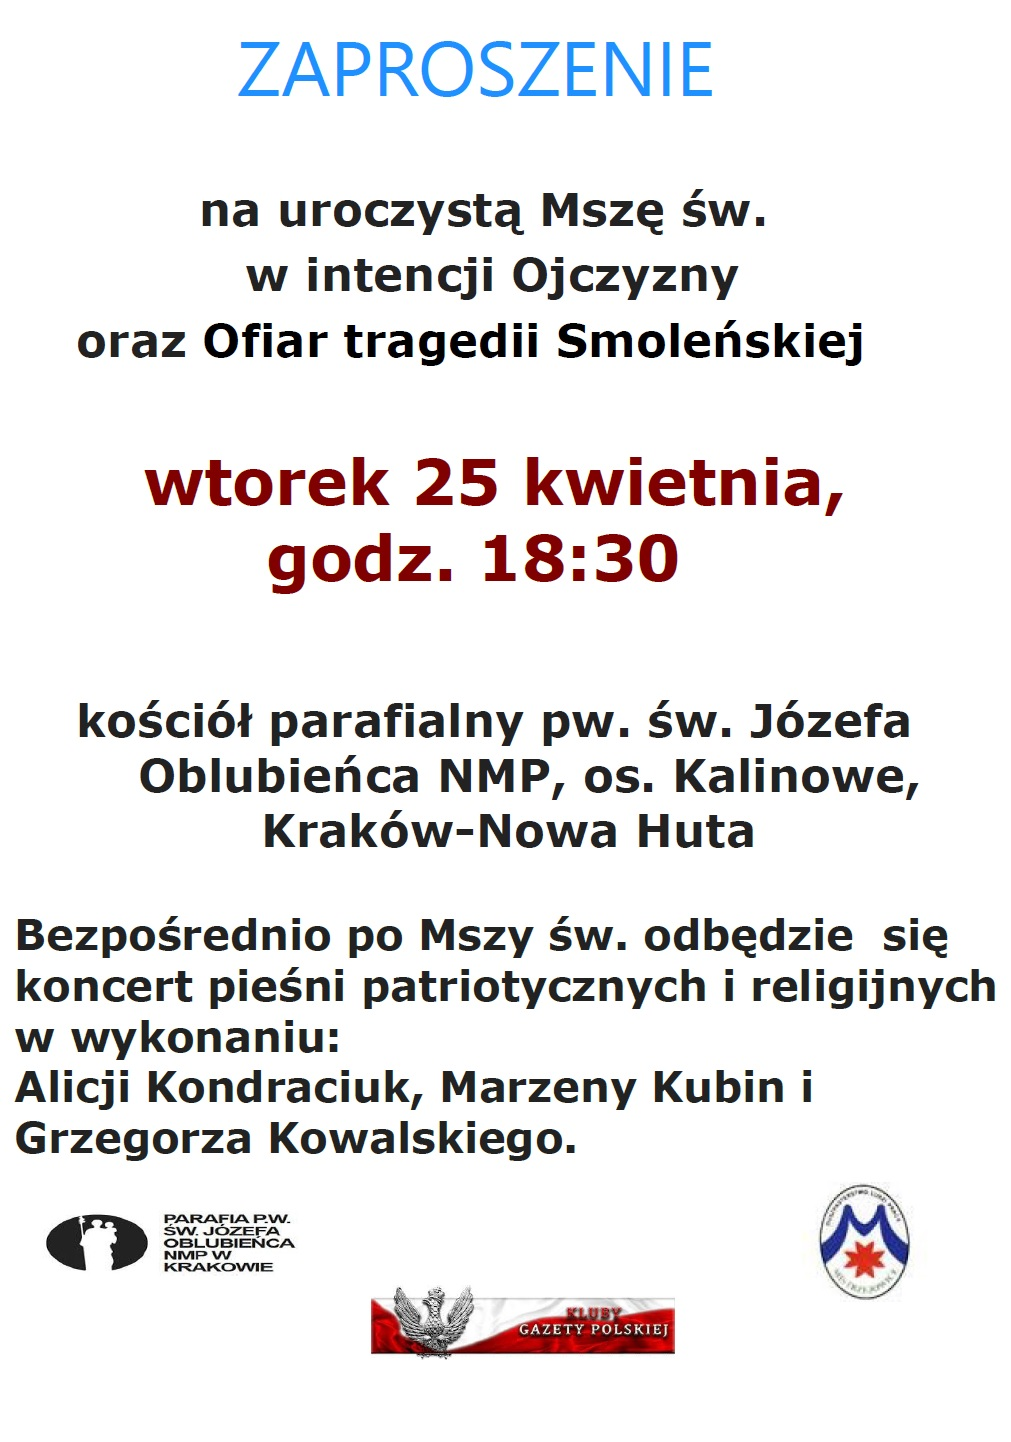 Krakow Nowa Huta 25 kwietnia 2017